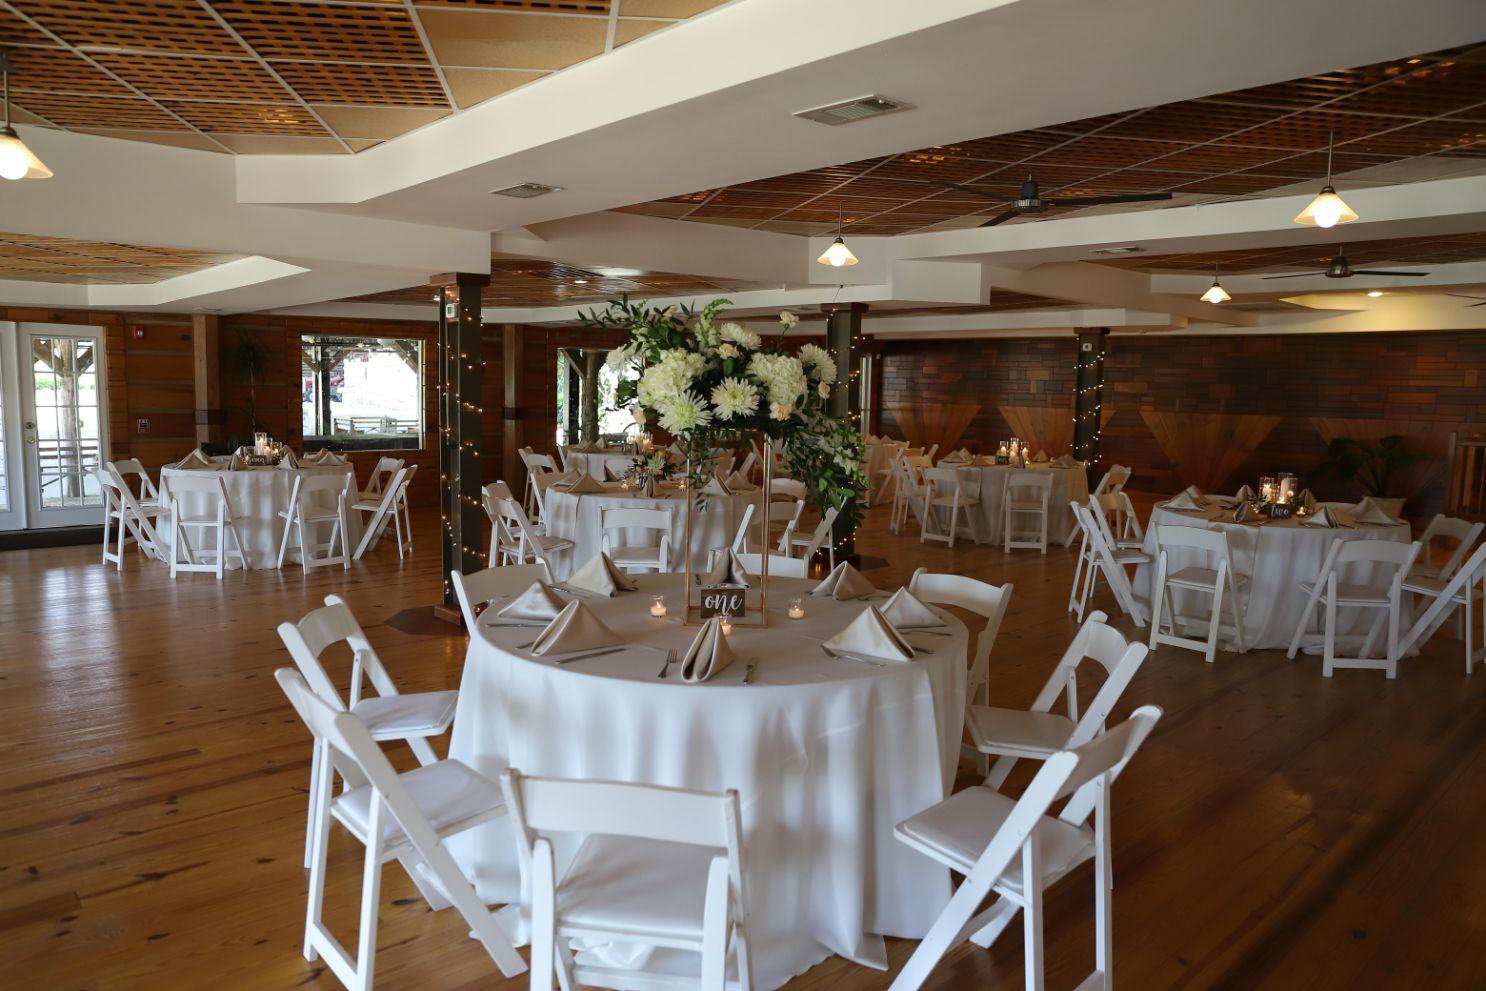 IMG 6908 nashville wedding venue lebanon tn tennessee wedding venue rustic overnight stay catering 1